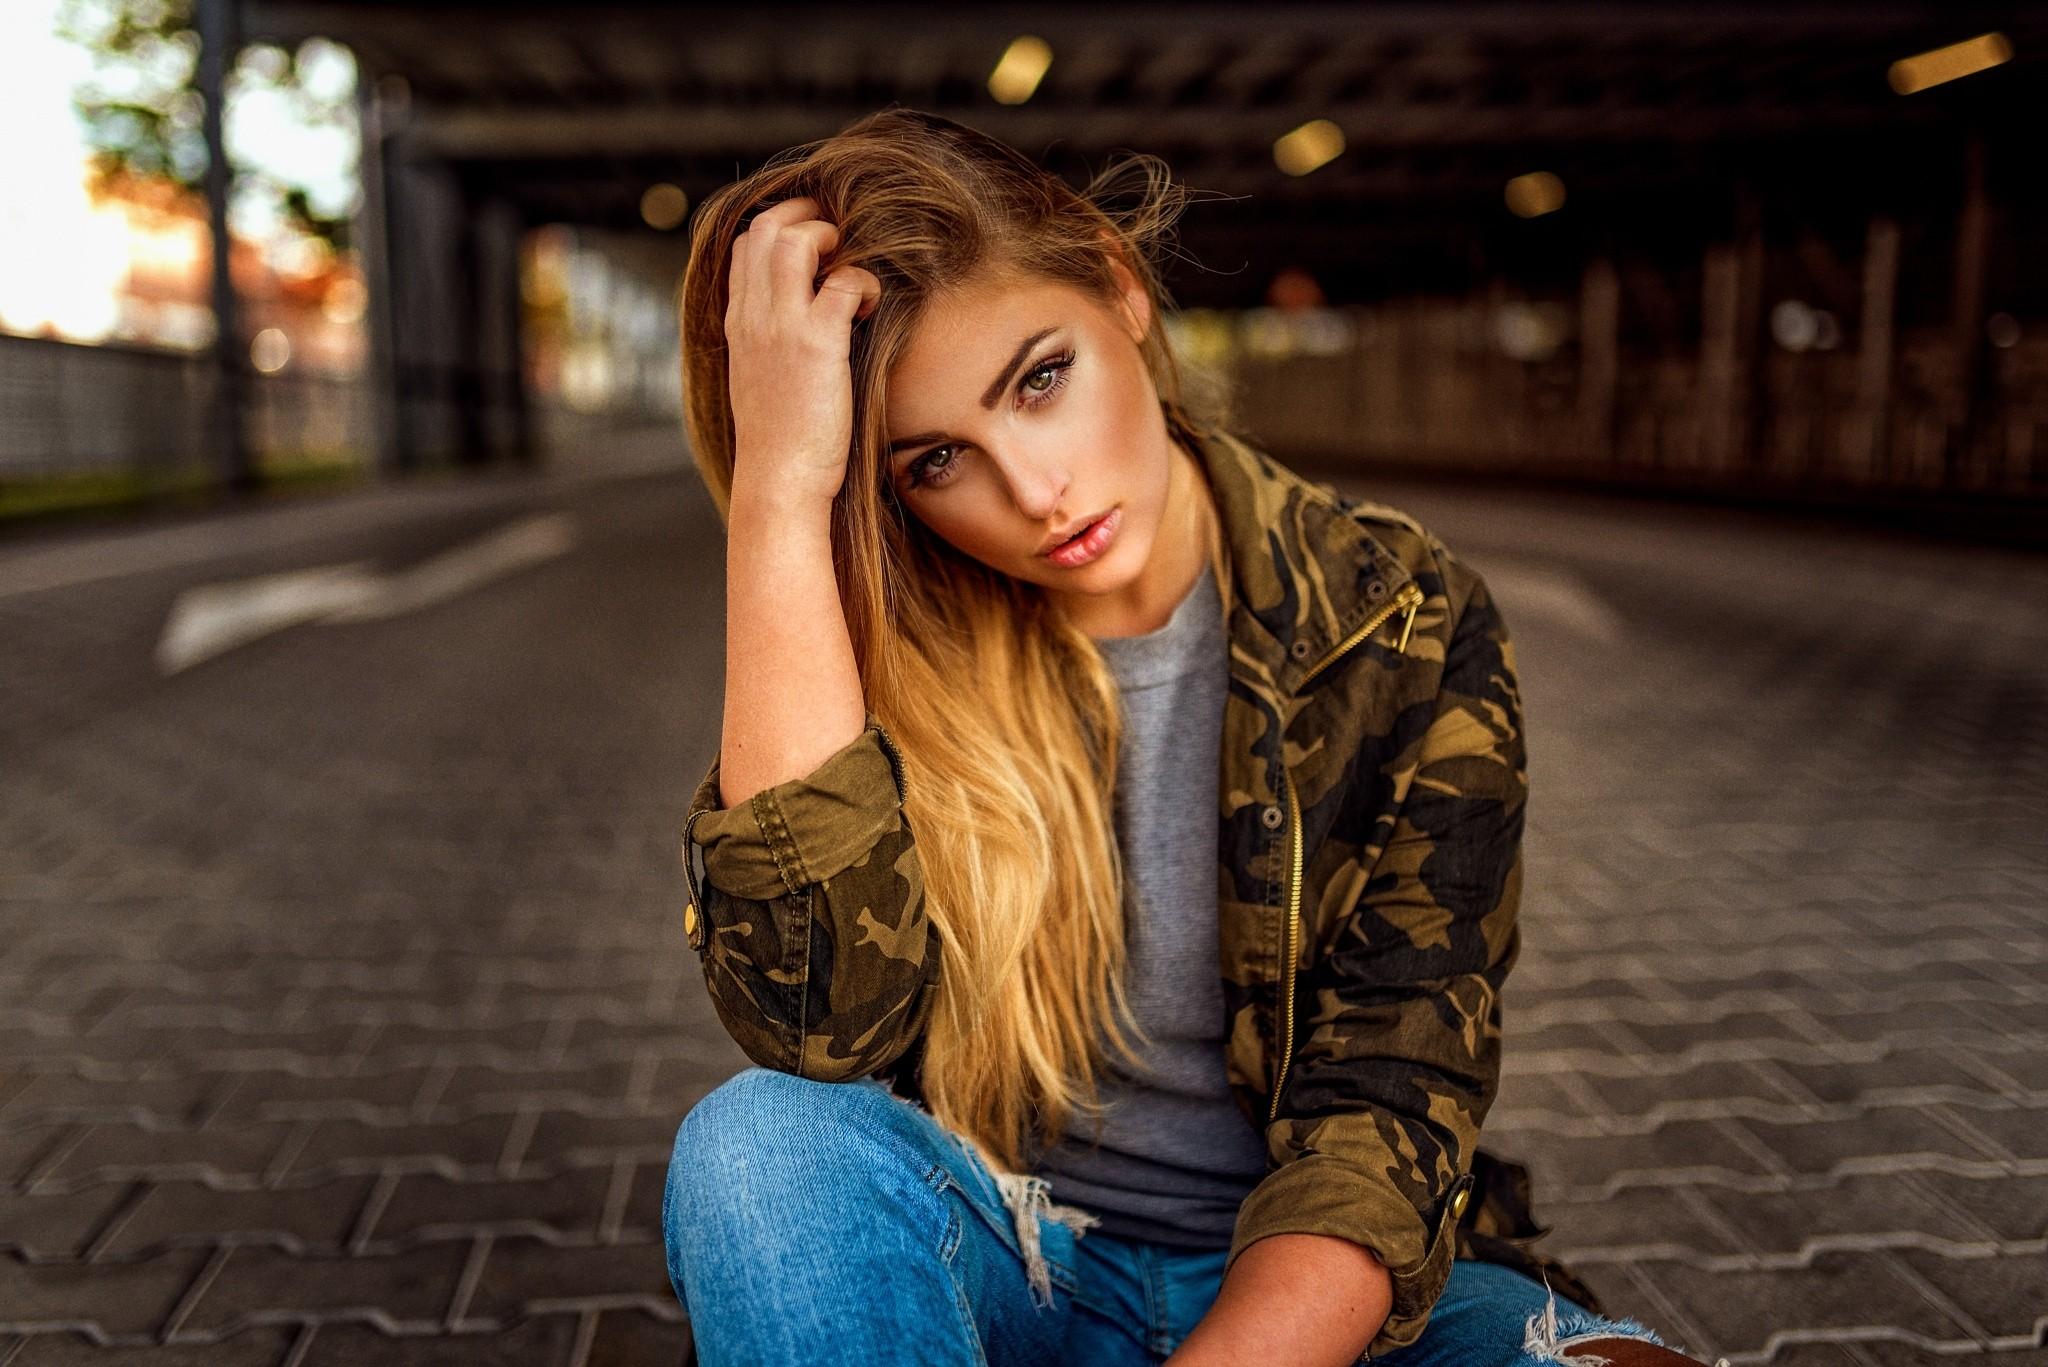 Девушка крутая картинки